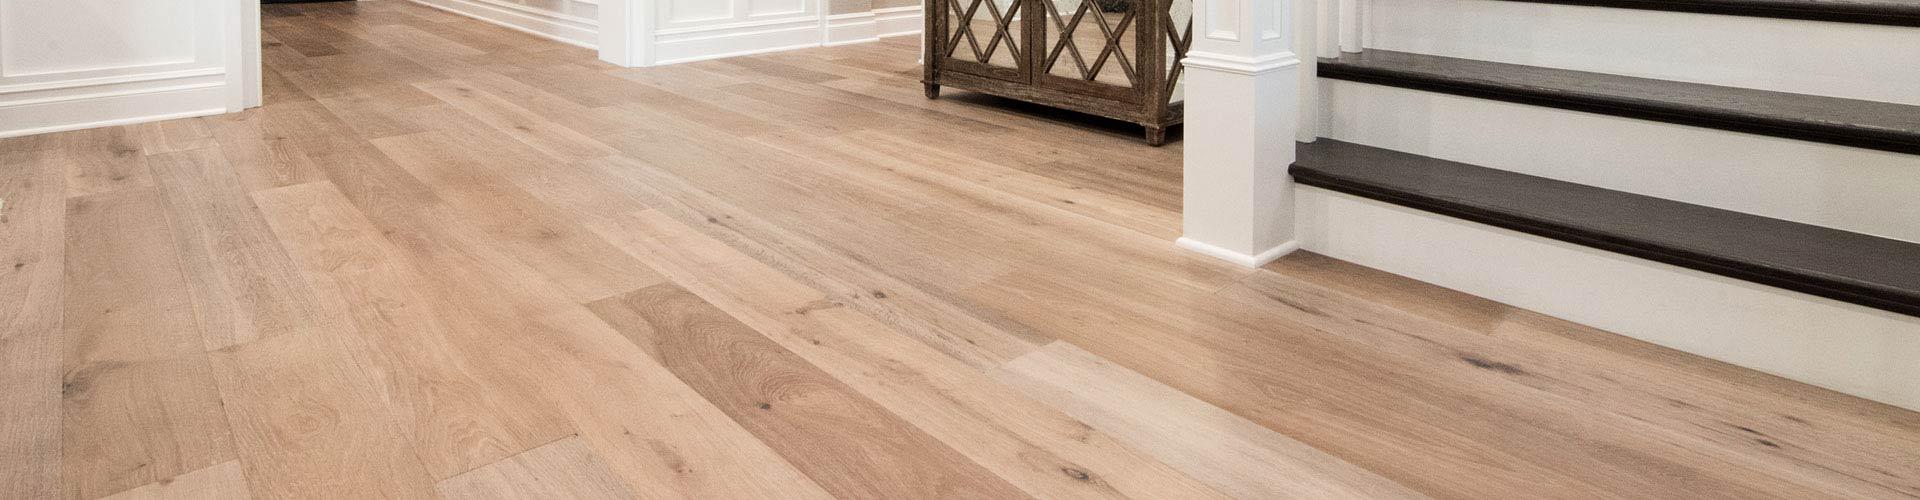 hardwood floor on main level